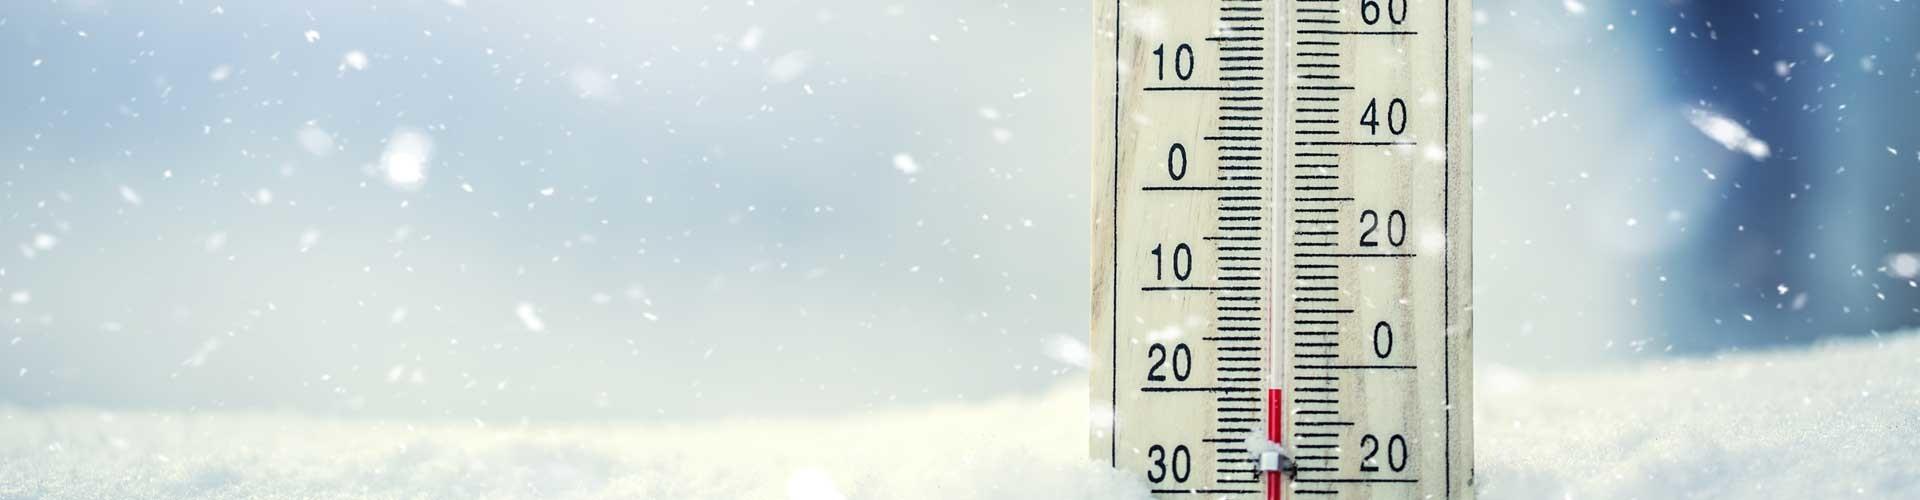 Schneefall, Winter, Temperatur, Kälte, Eis, Schnee © weyo , Adobe Stock